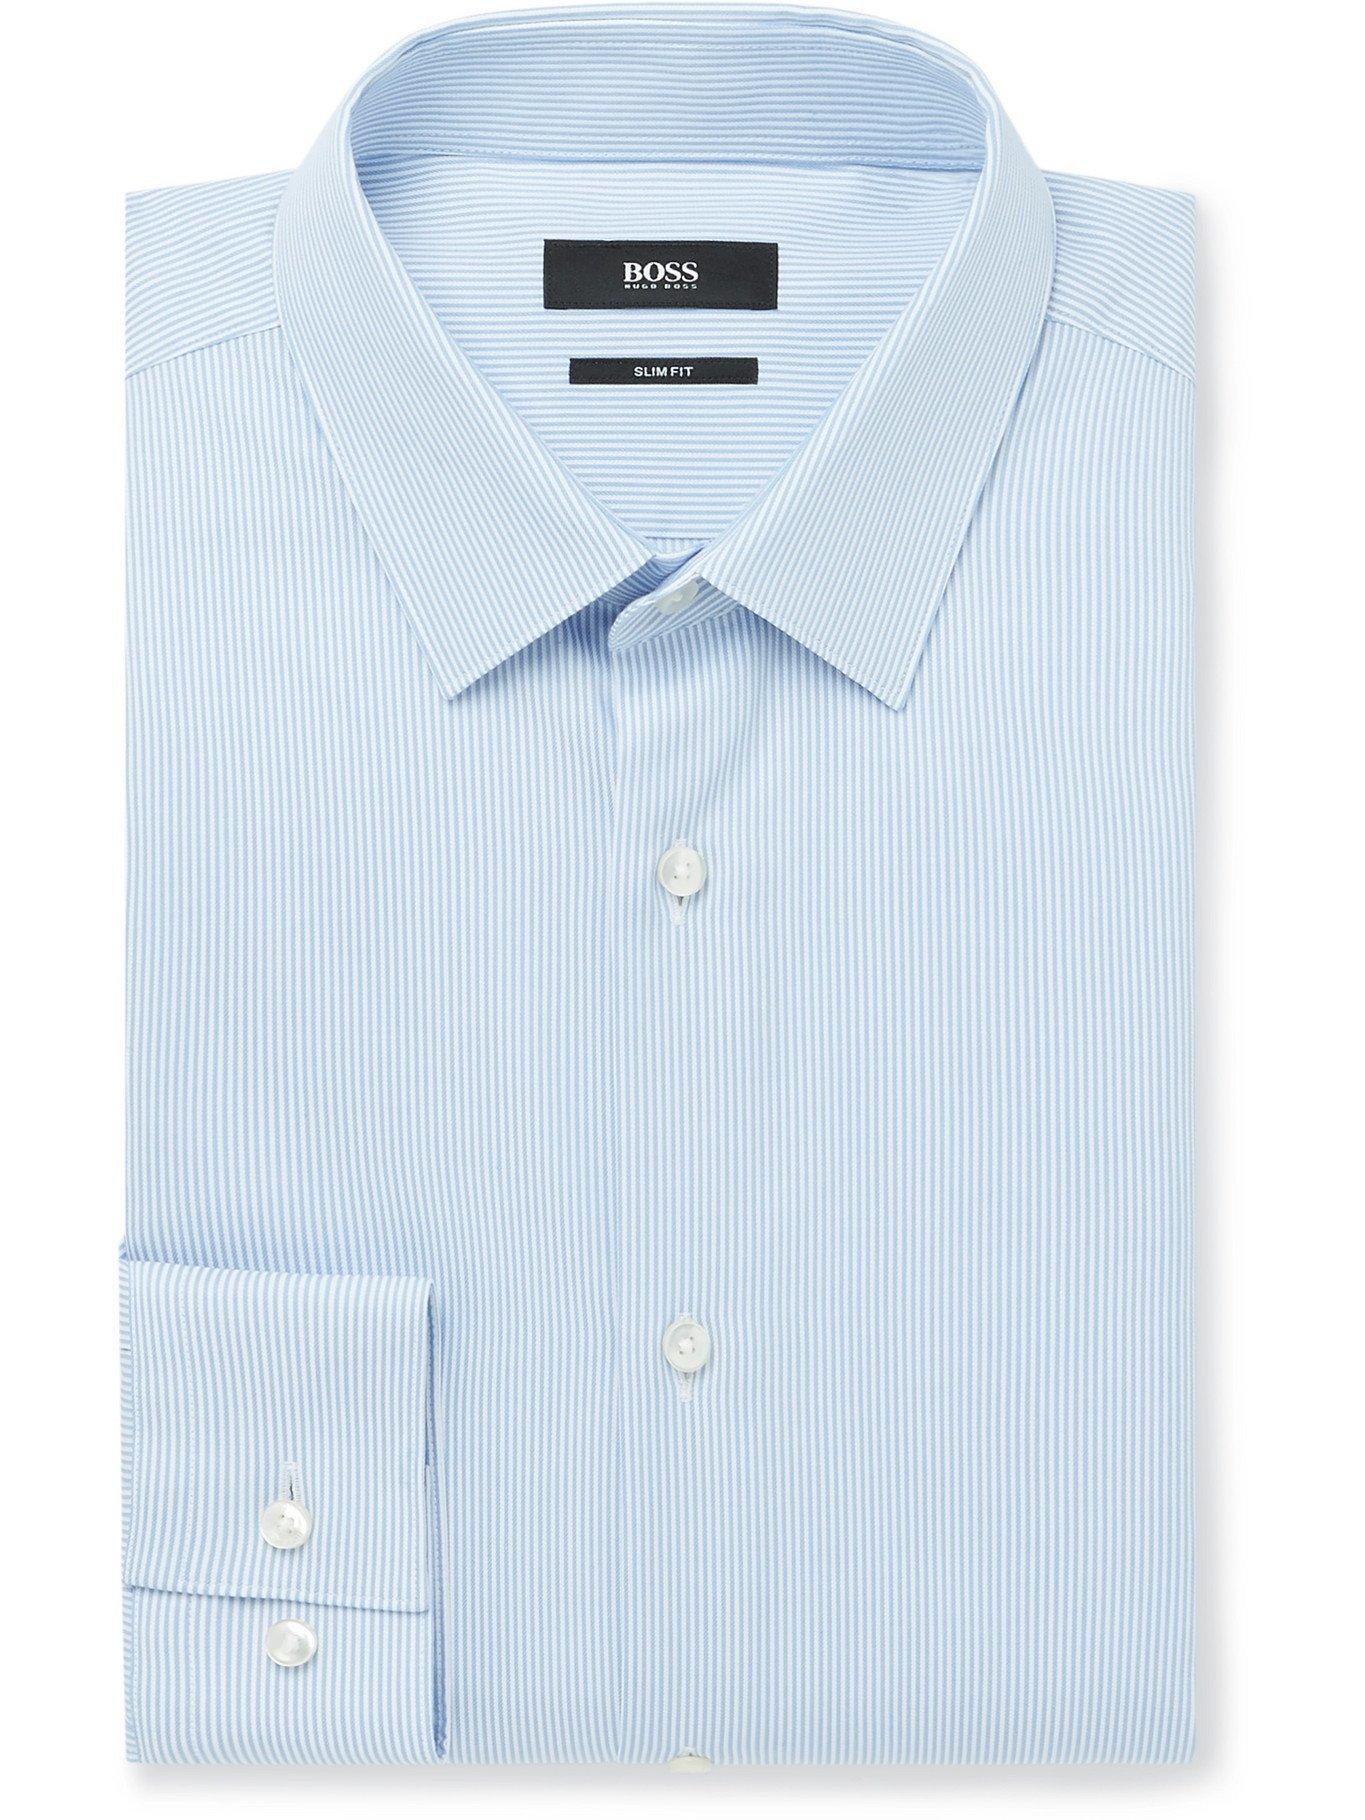 HUGO BOSS - Slim-Fit Pinstriped Cotton and TENCEL Lyocell-Blend Shirt - Blue